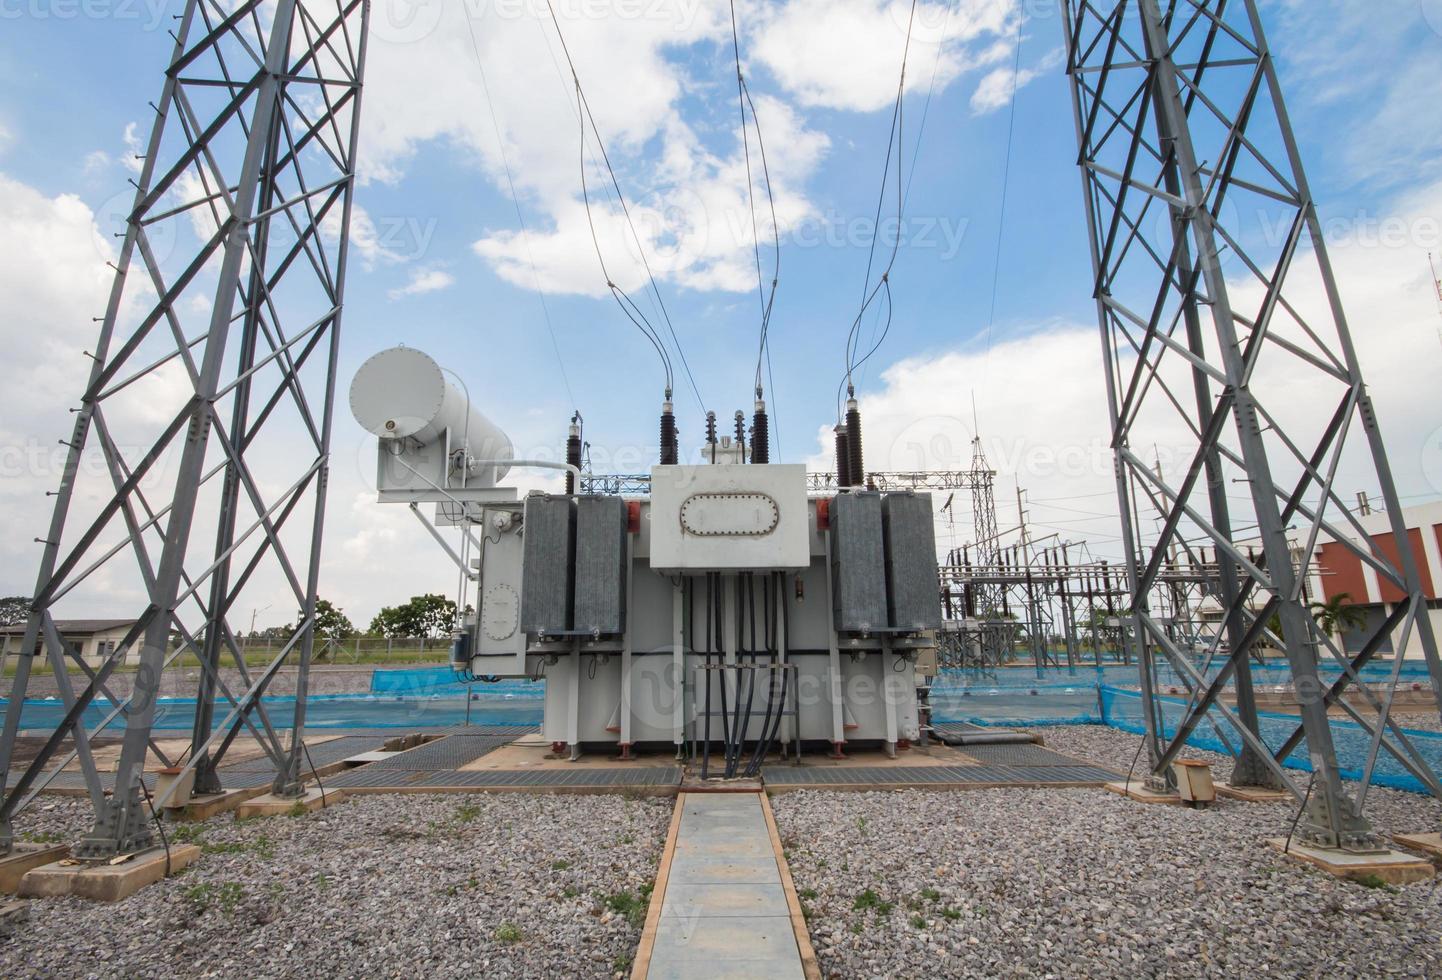 Power transformer in sub station 115 kv/22 kv photo